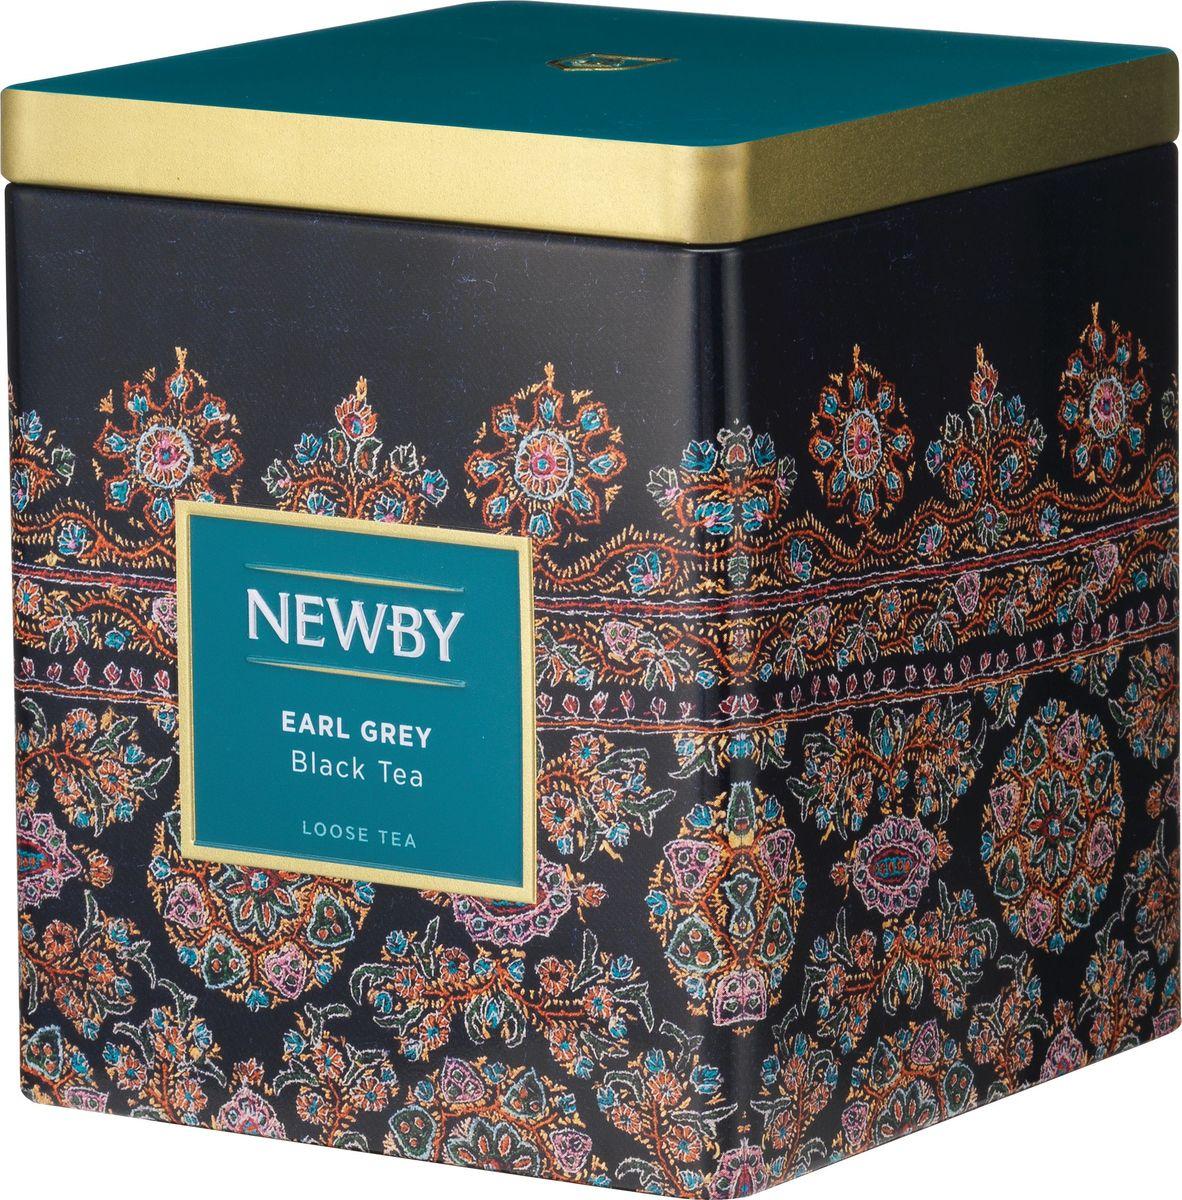 Newby Earl Grey черный листовой чай, 125 г jaf tea earl grey classic чай черный листовой с ароматом бергамота 100 г